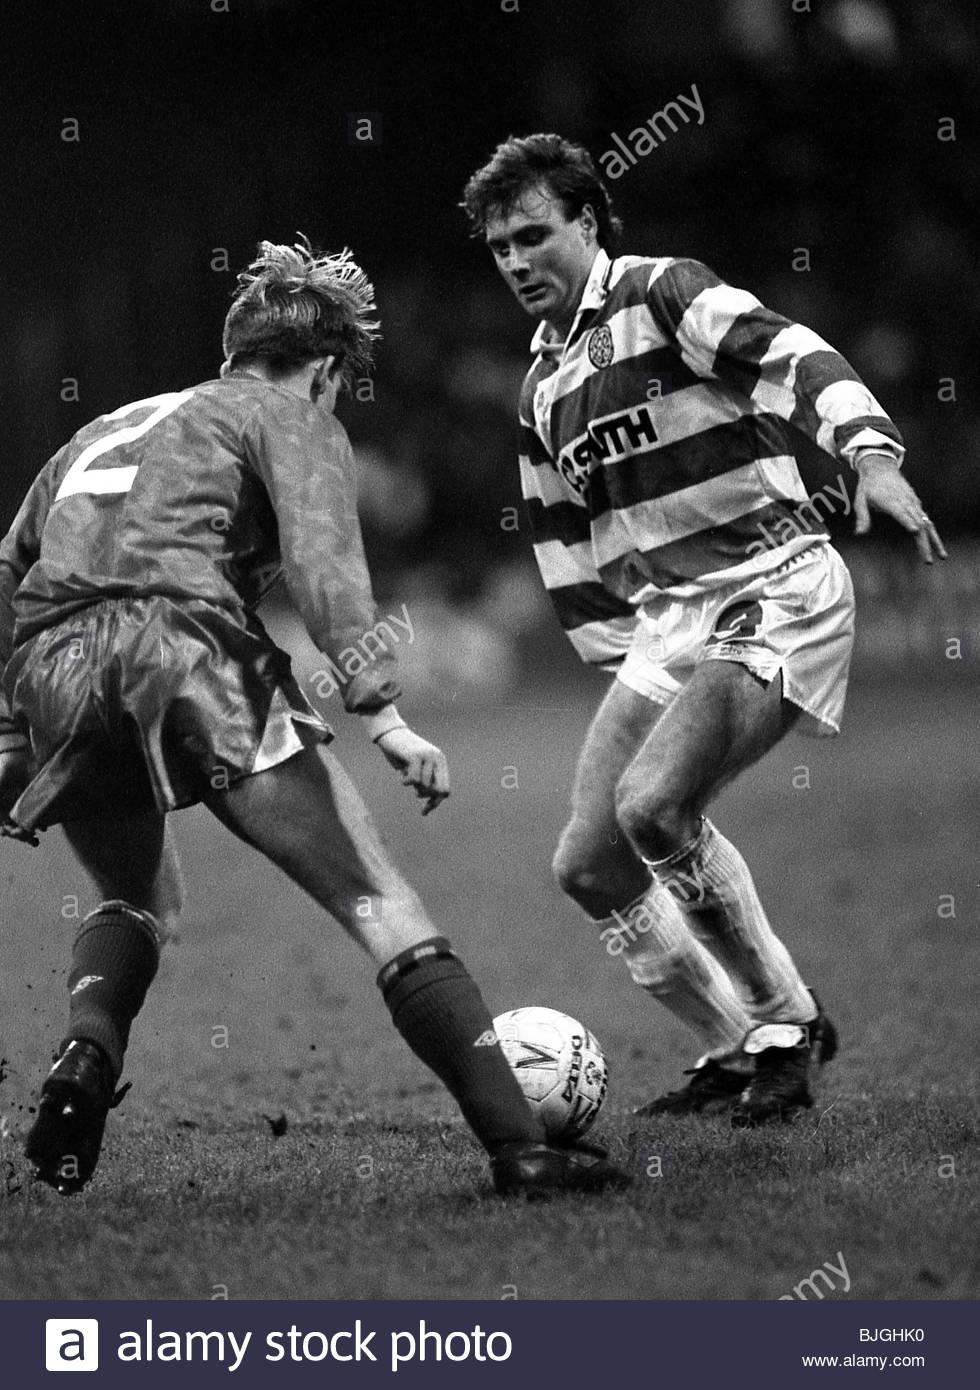 19/01/91 PREMIER DIVISION CELTIC V ABERDEEN (1-0) CELTIC PARK - GLASGOW Celtic striker Tommy Coyne takes on Stephen - Stock Image